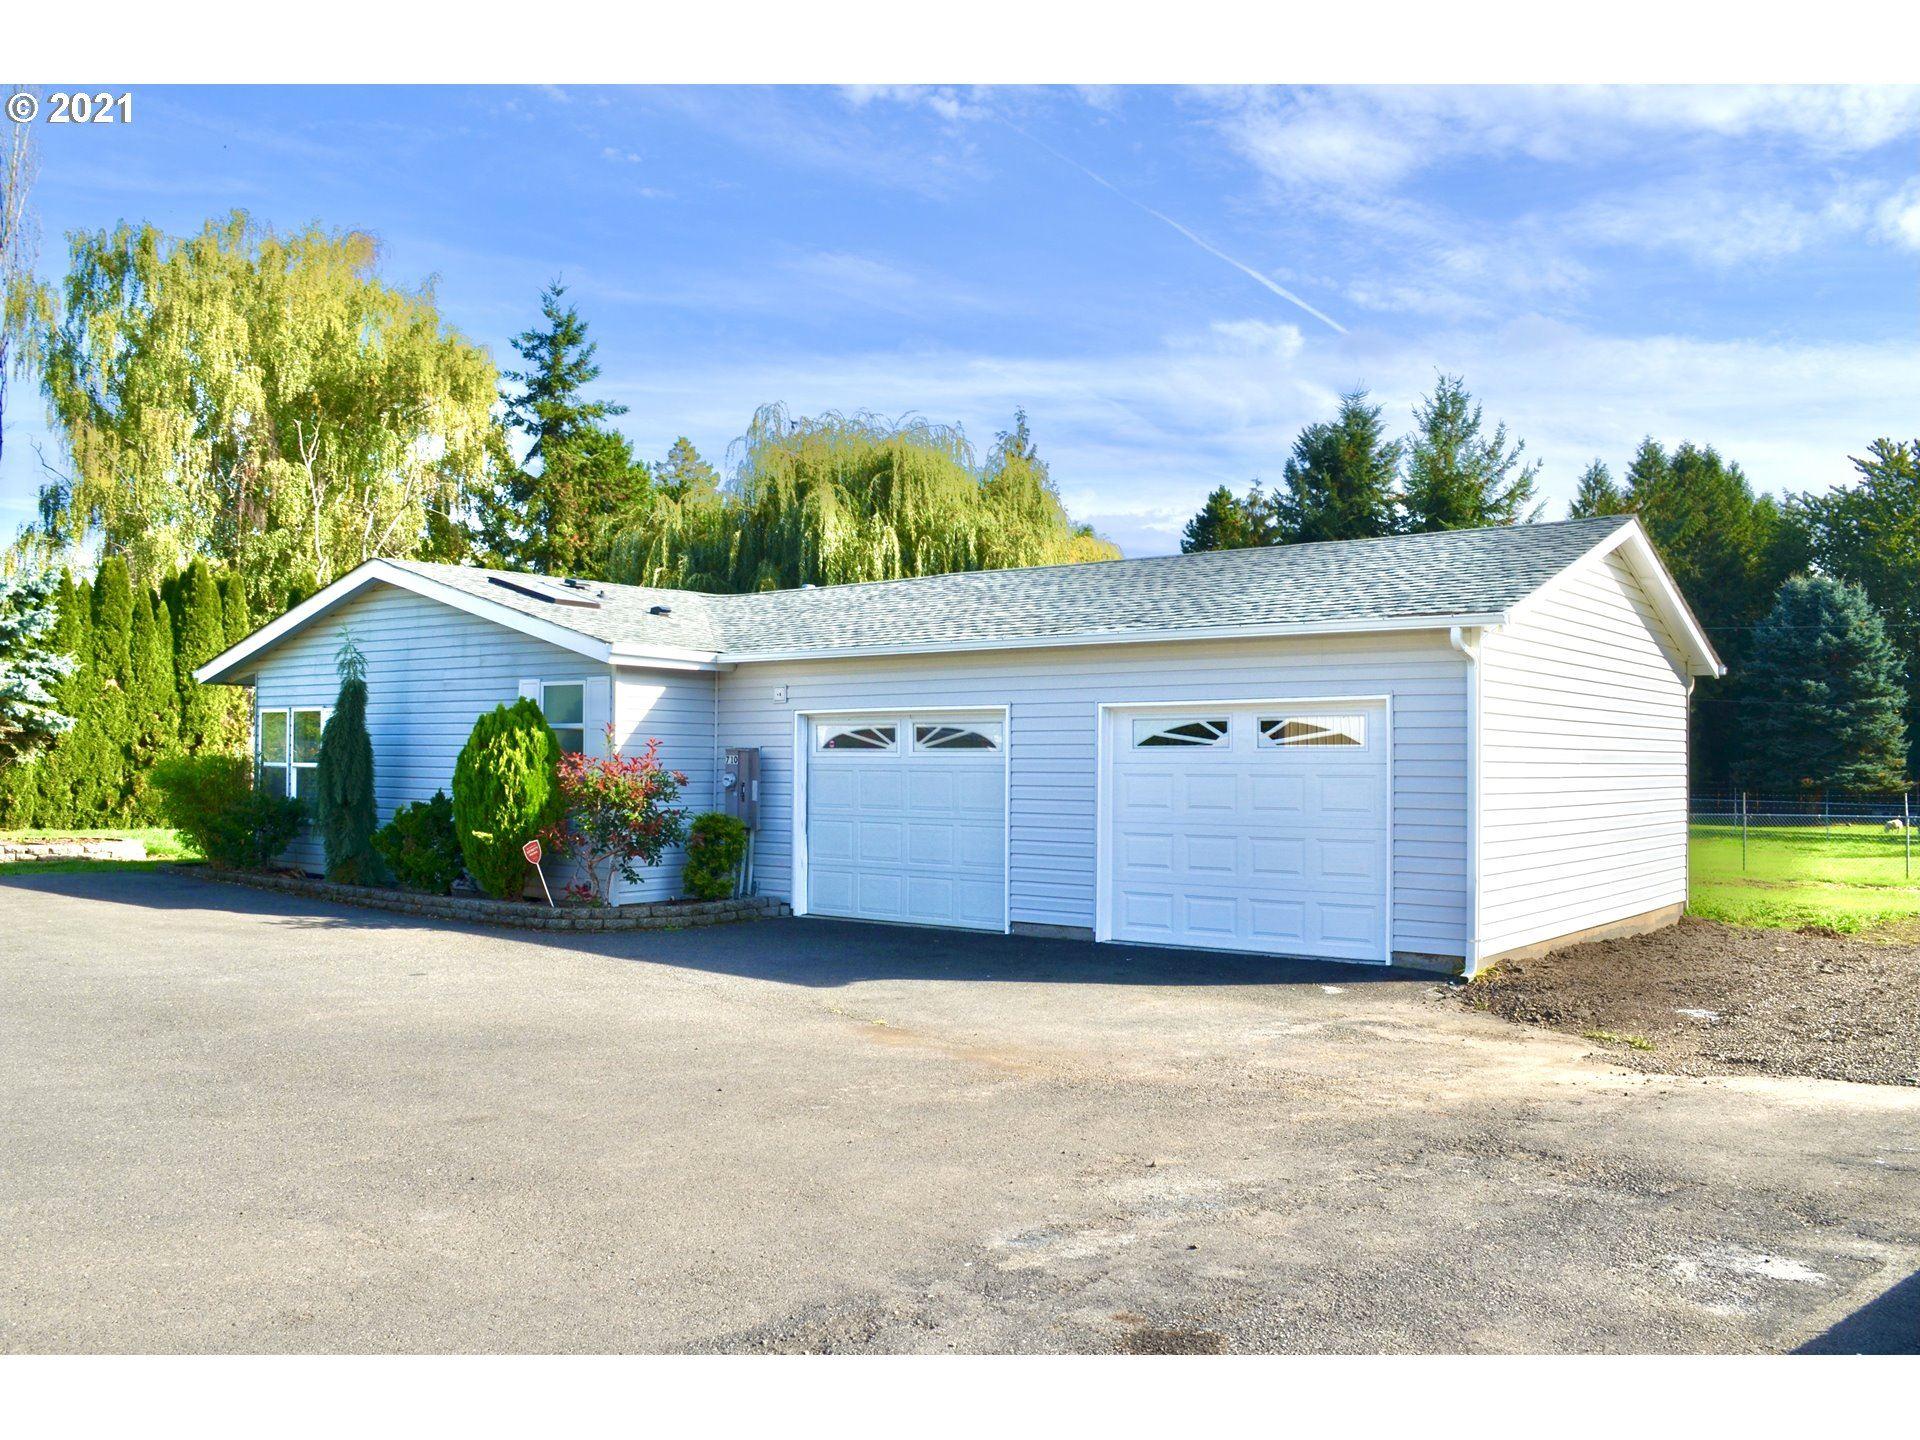 7101 NE 31ST AVE, Vancouver, WA 98665 - MLS#: 21584590